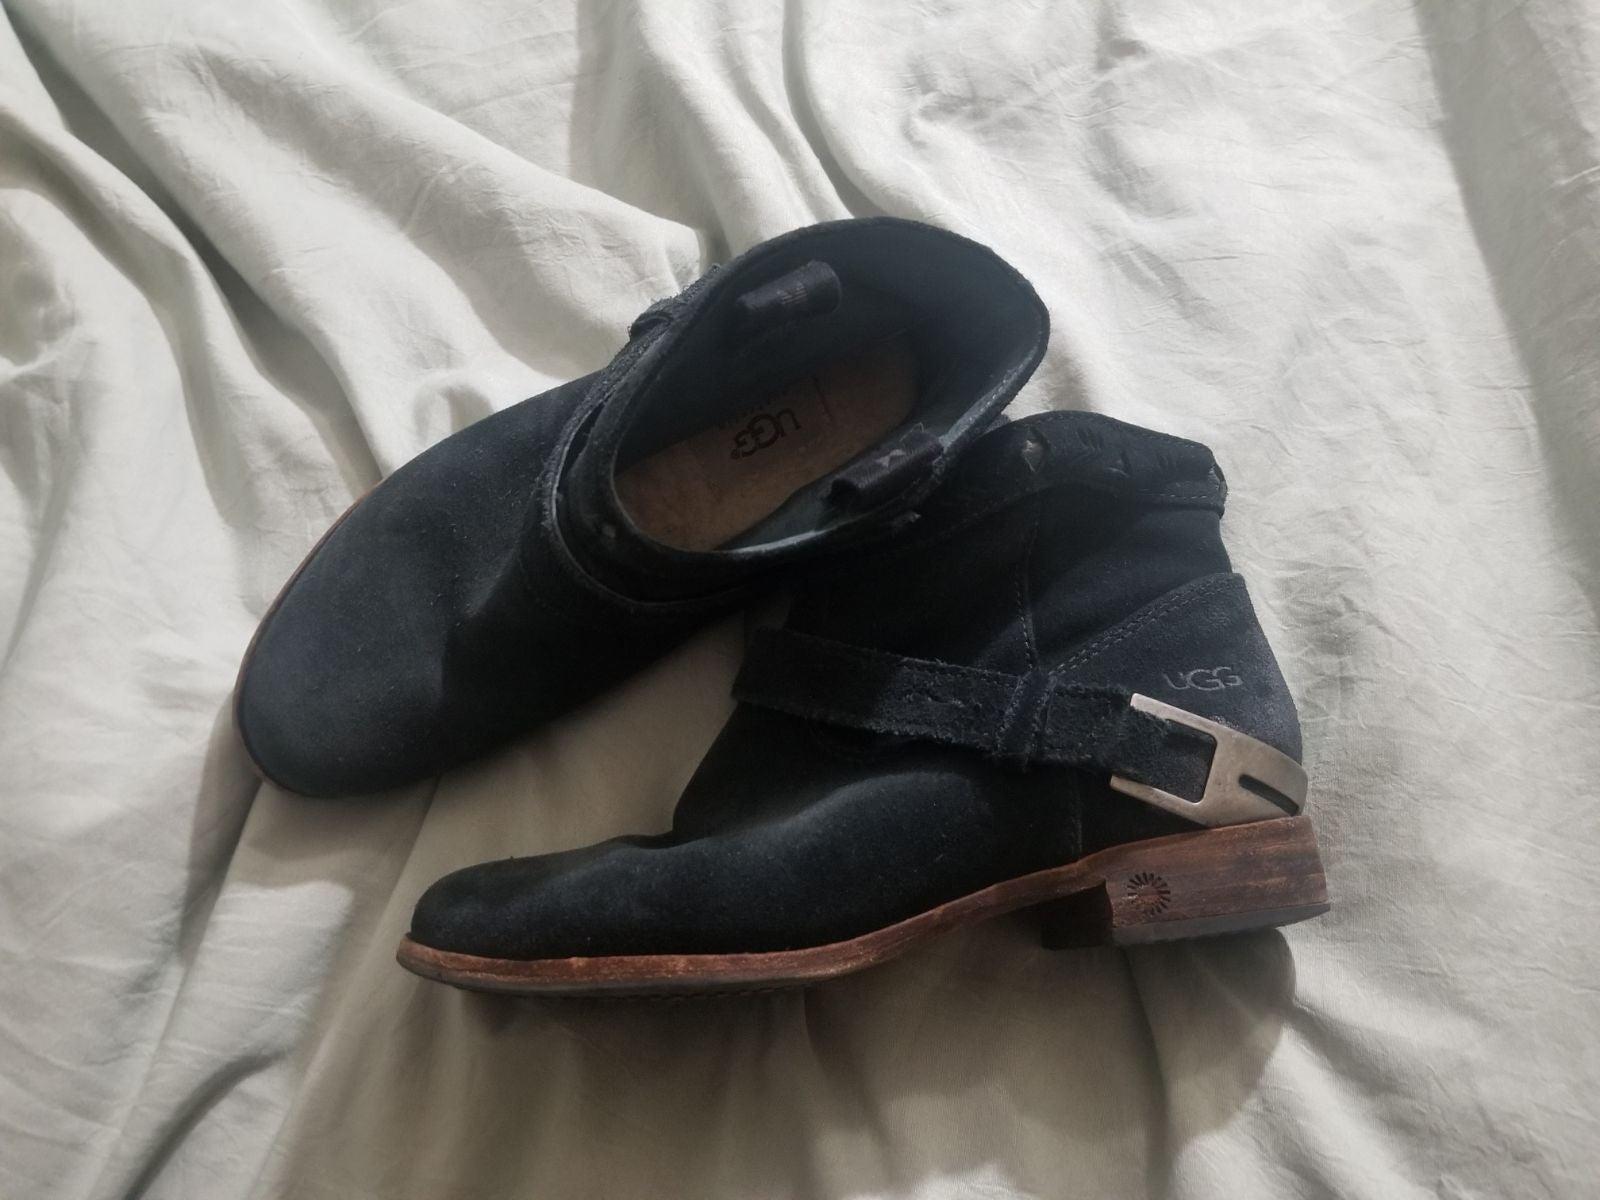 Black booties - UGG size 5